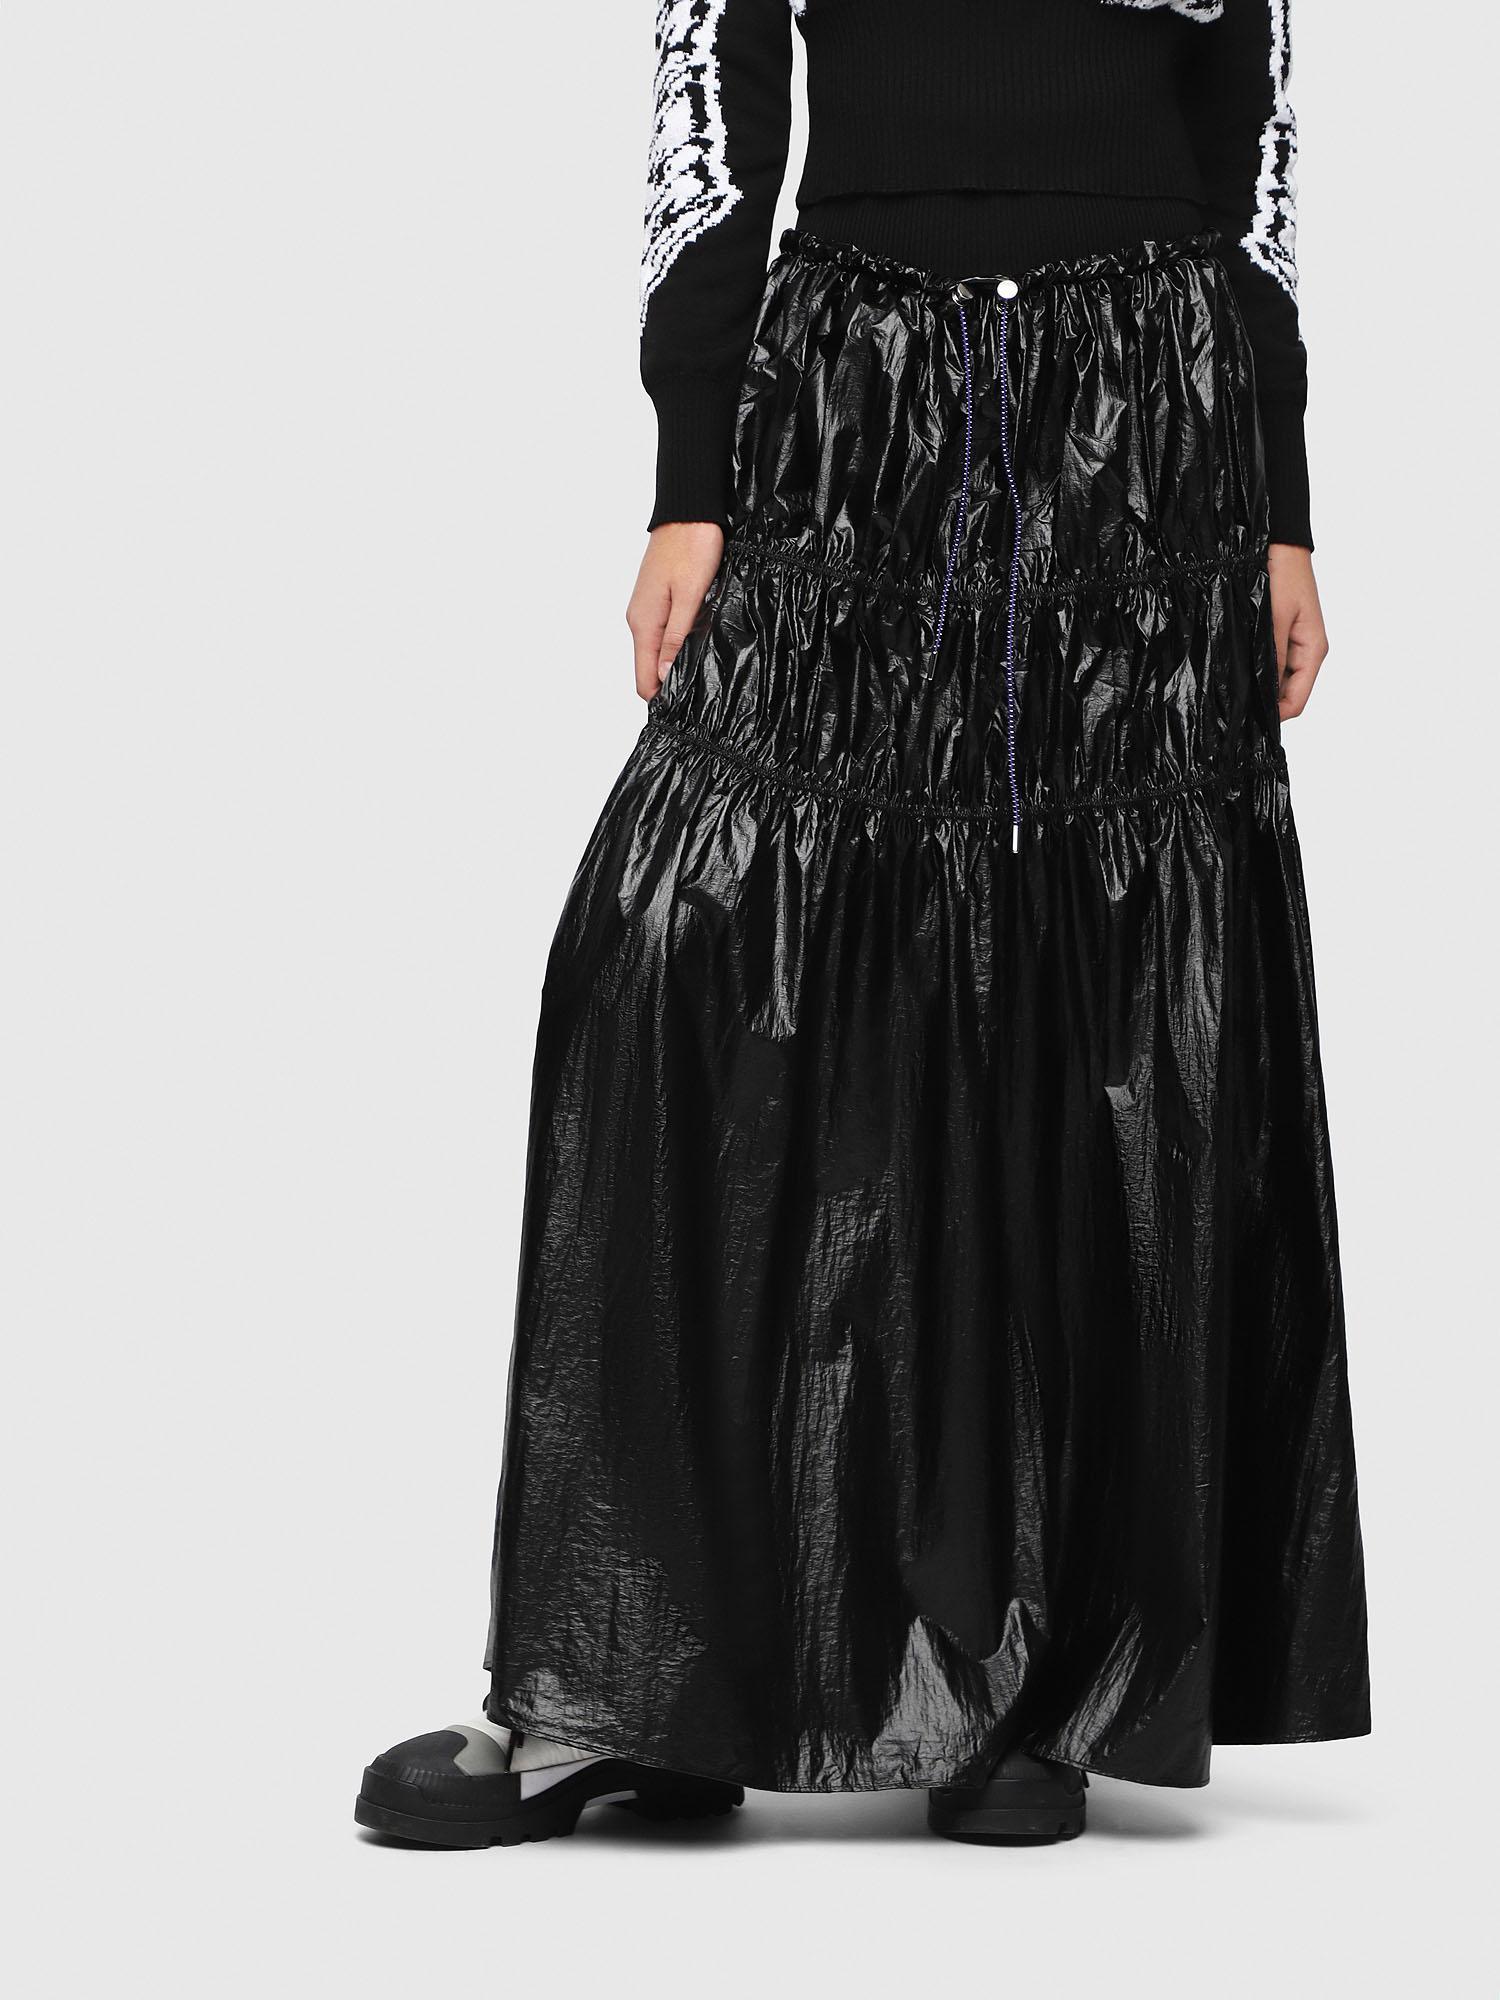 3d1e797422 DIESEL - Black Tiered Nylon Maxi Skirt - Lyst. View fullscreen